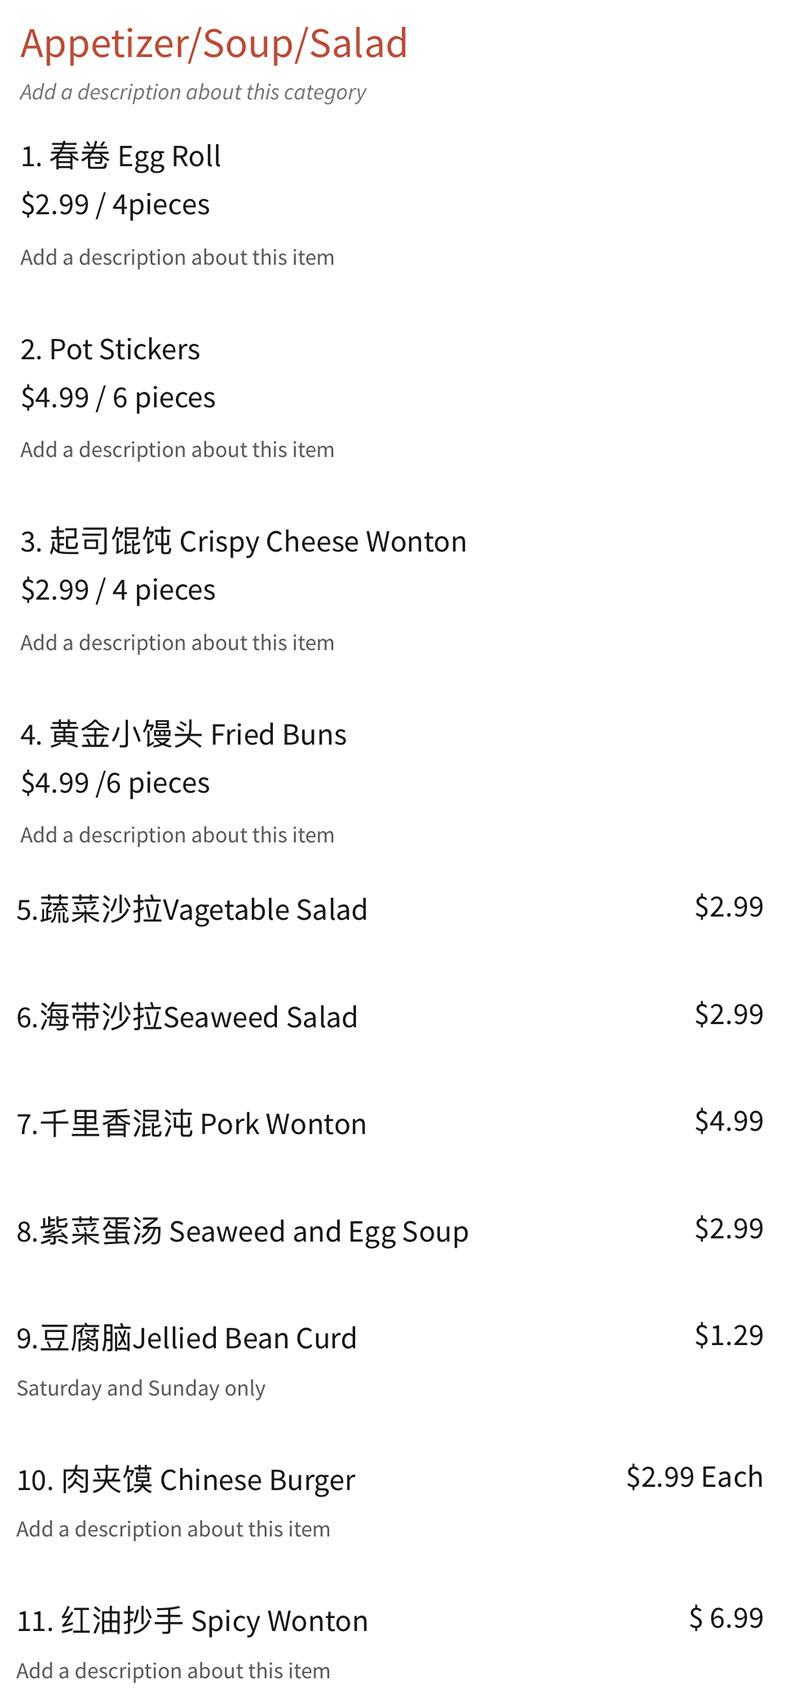 Chinese Taste menu - appetizer, soup, salad